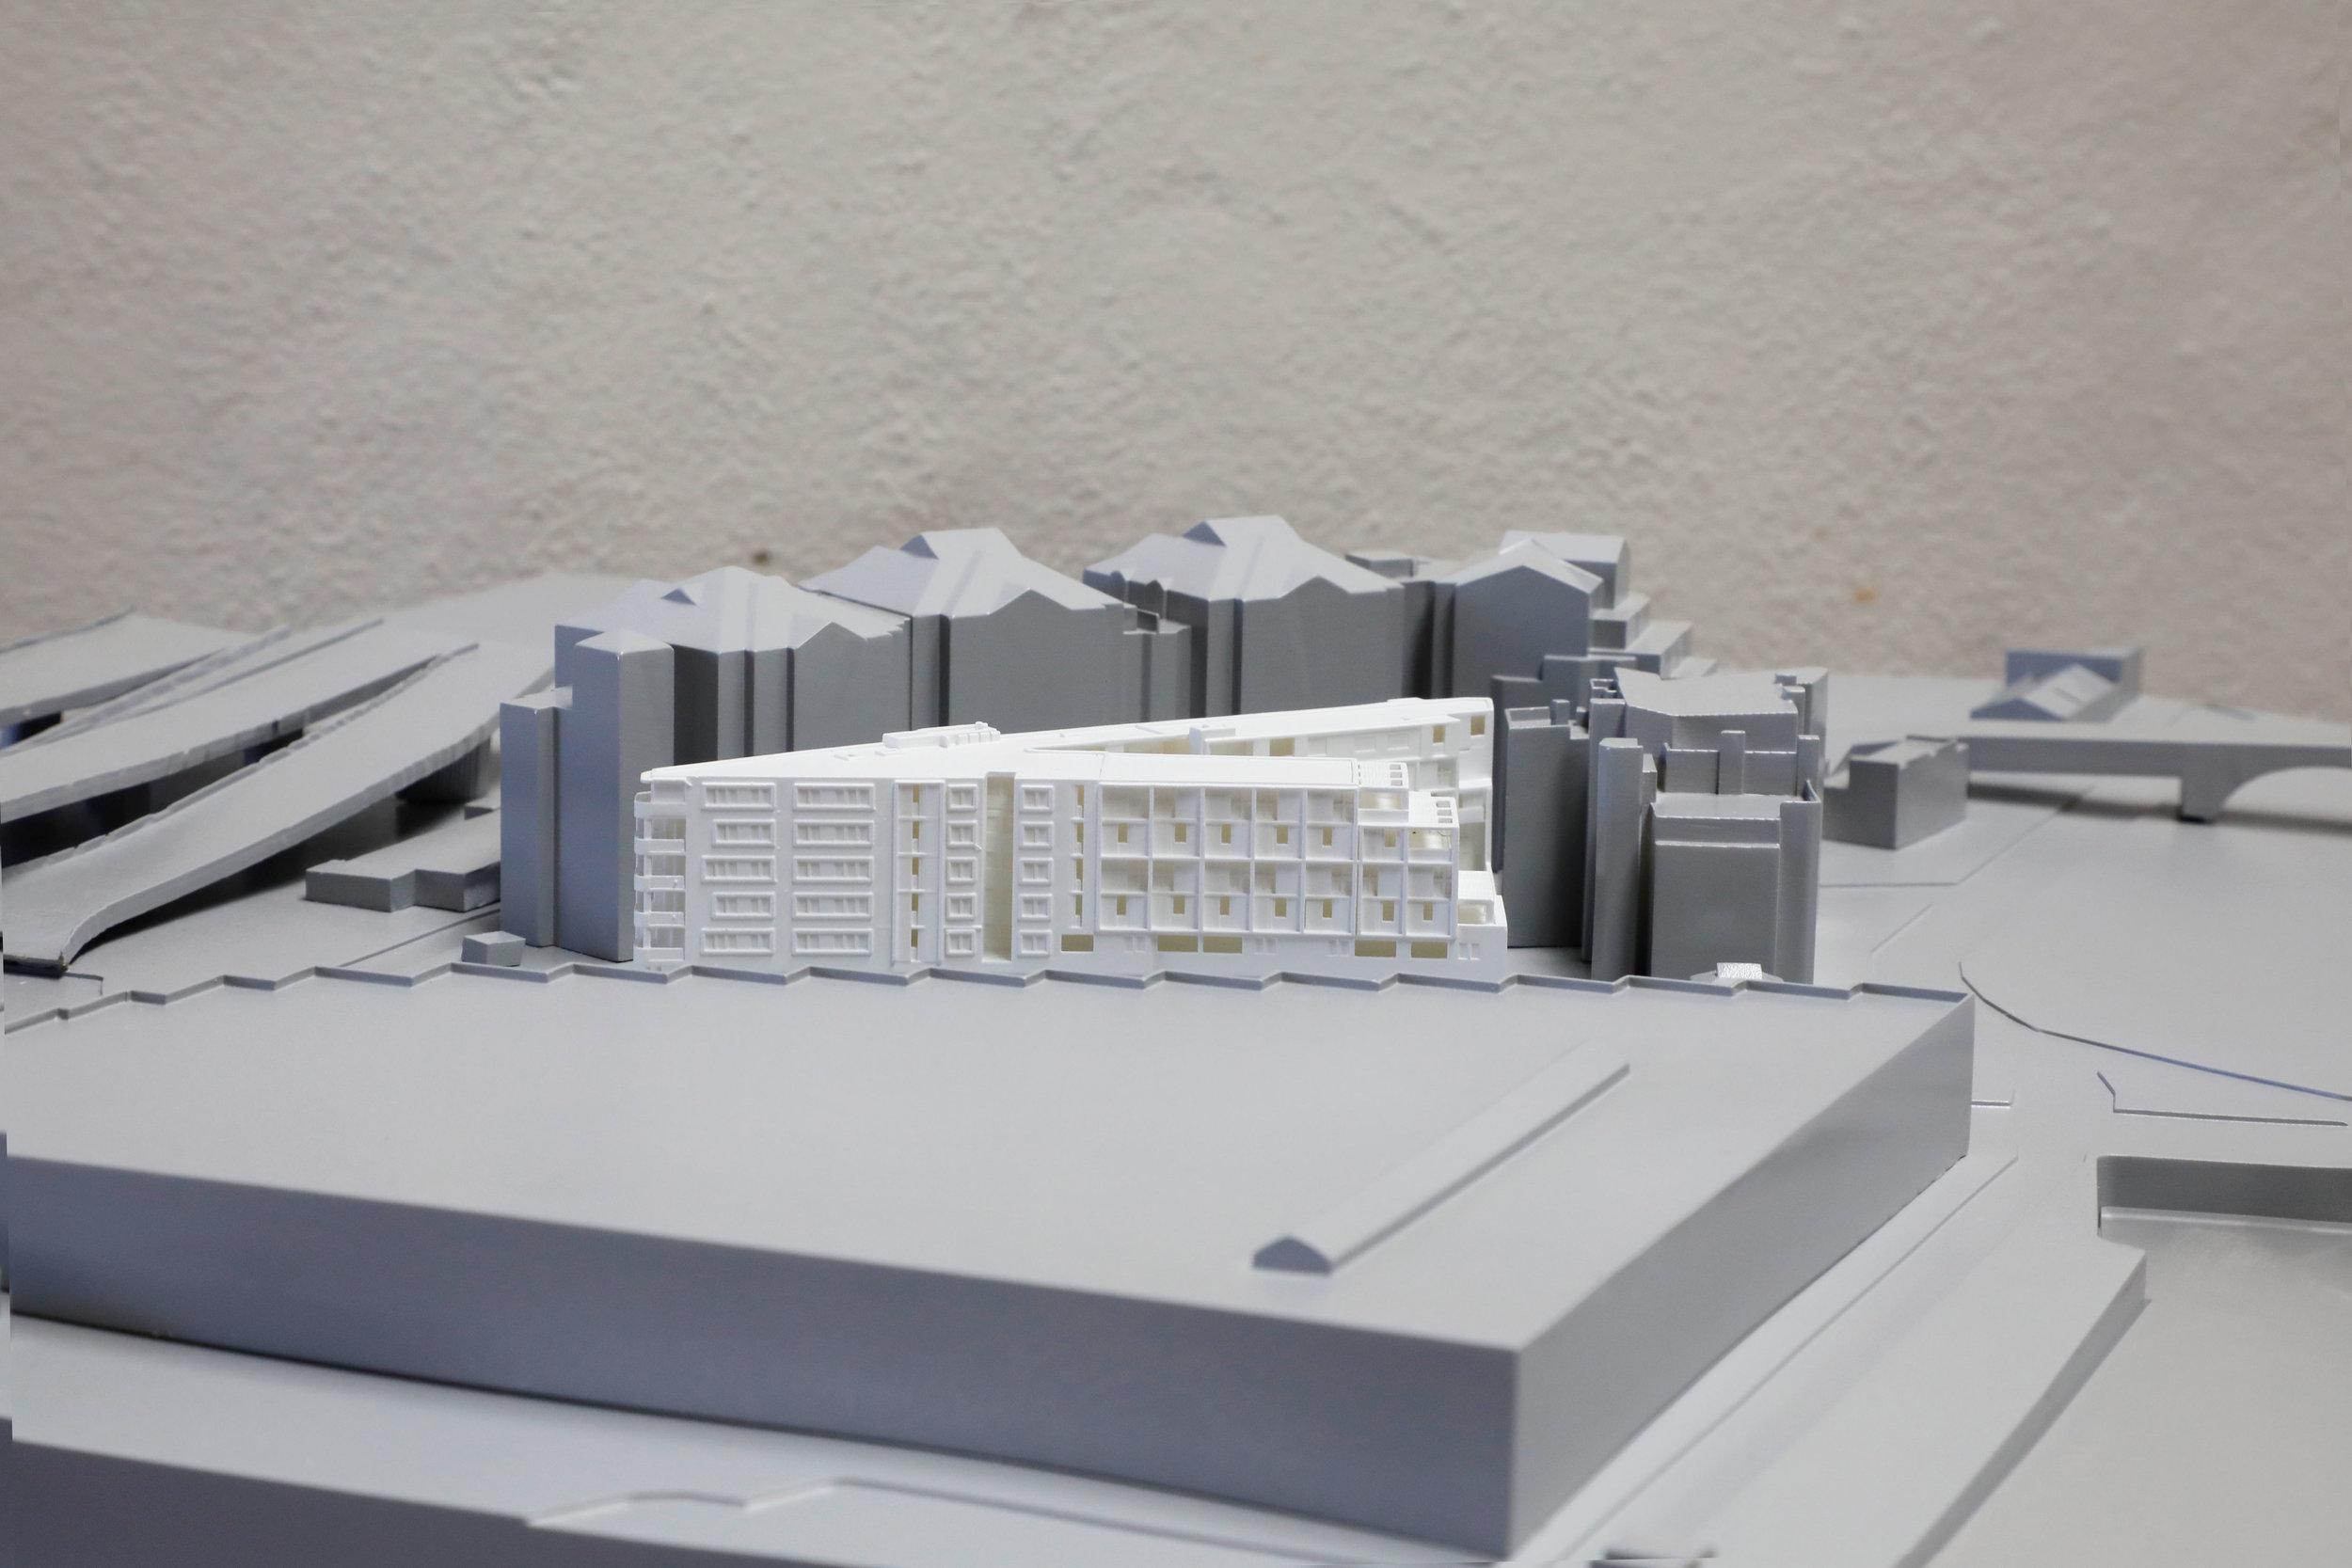 da_MODEL_CNC_architecture_timber_make_models_fabrication_sydney_CityofSydney_4.jpg